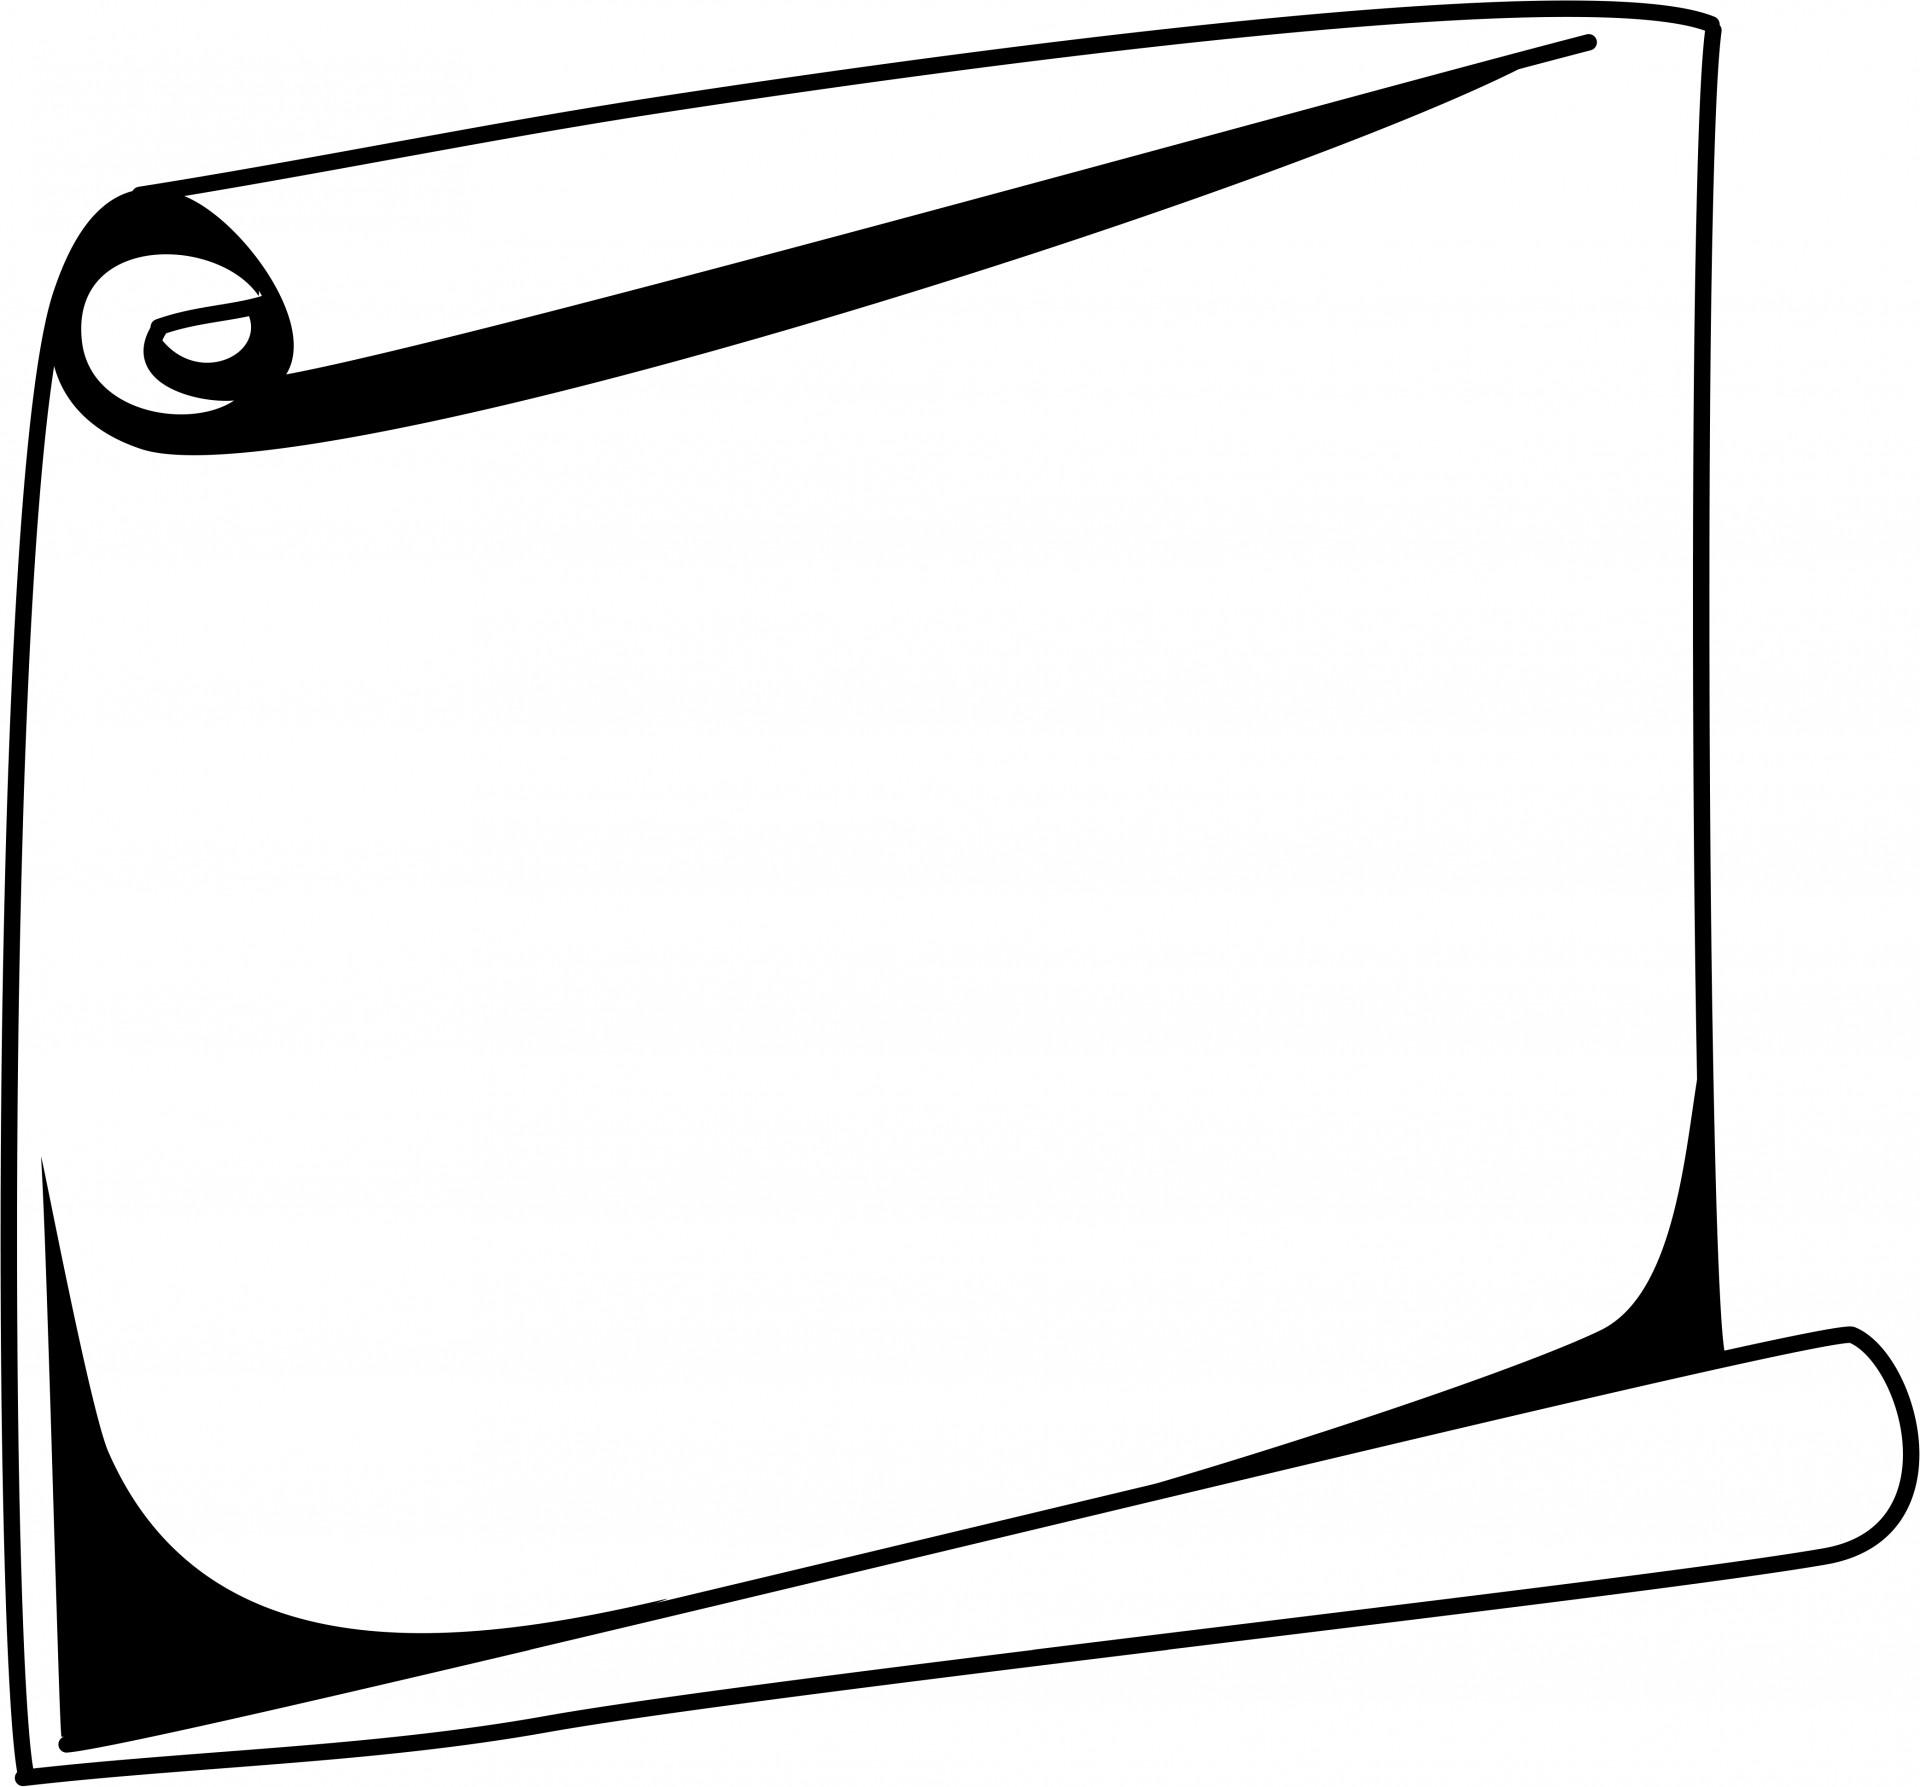 1920x1787 Scroll Border Clipart Free Stock Photo